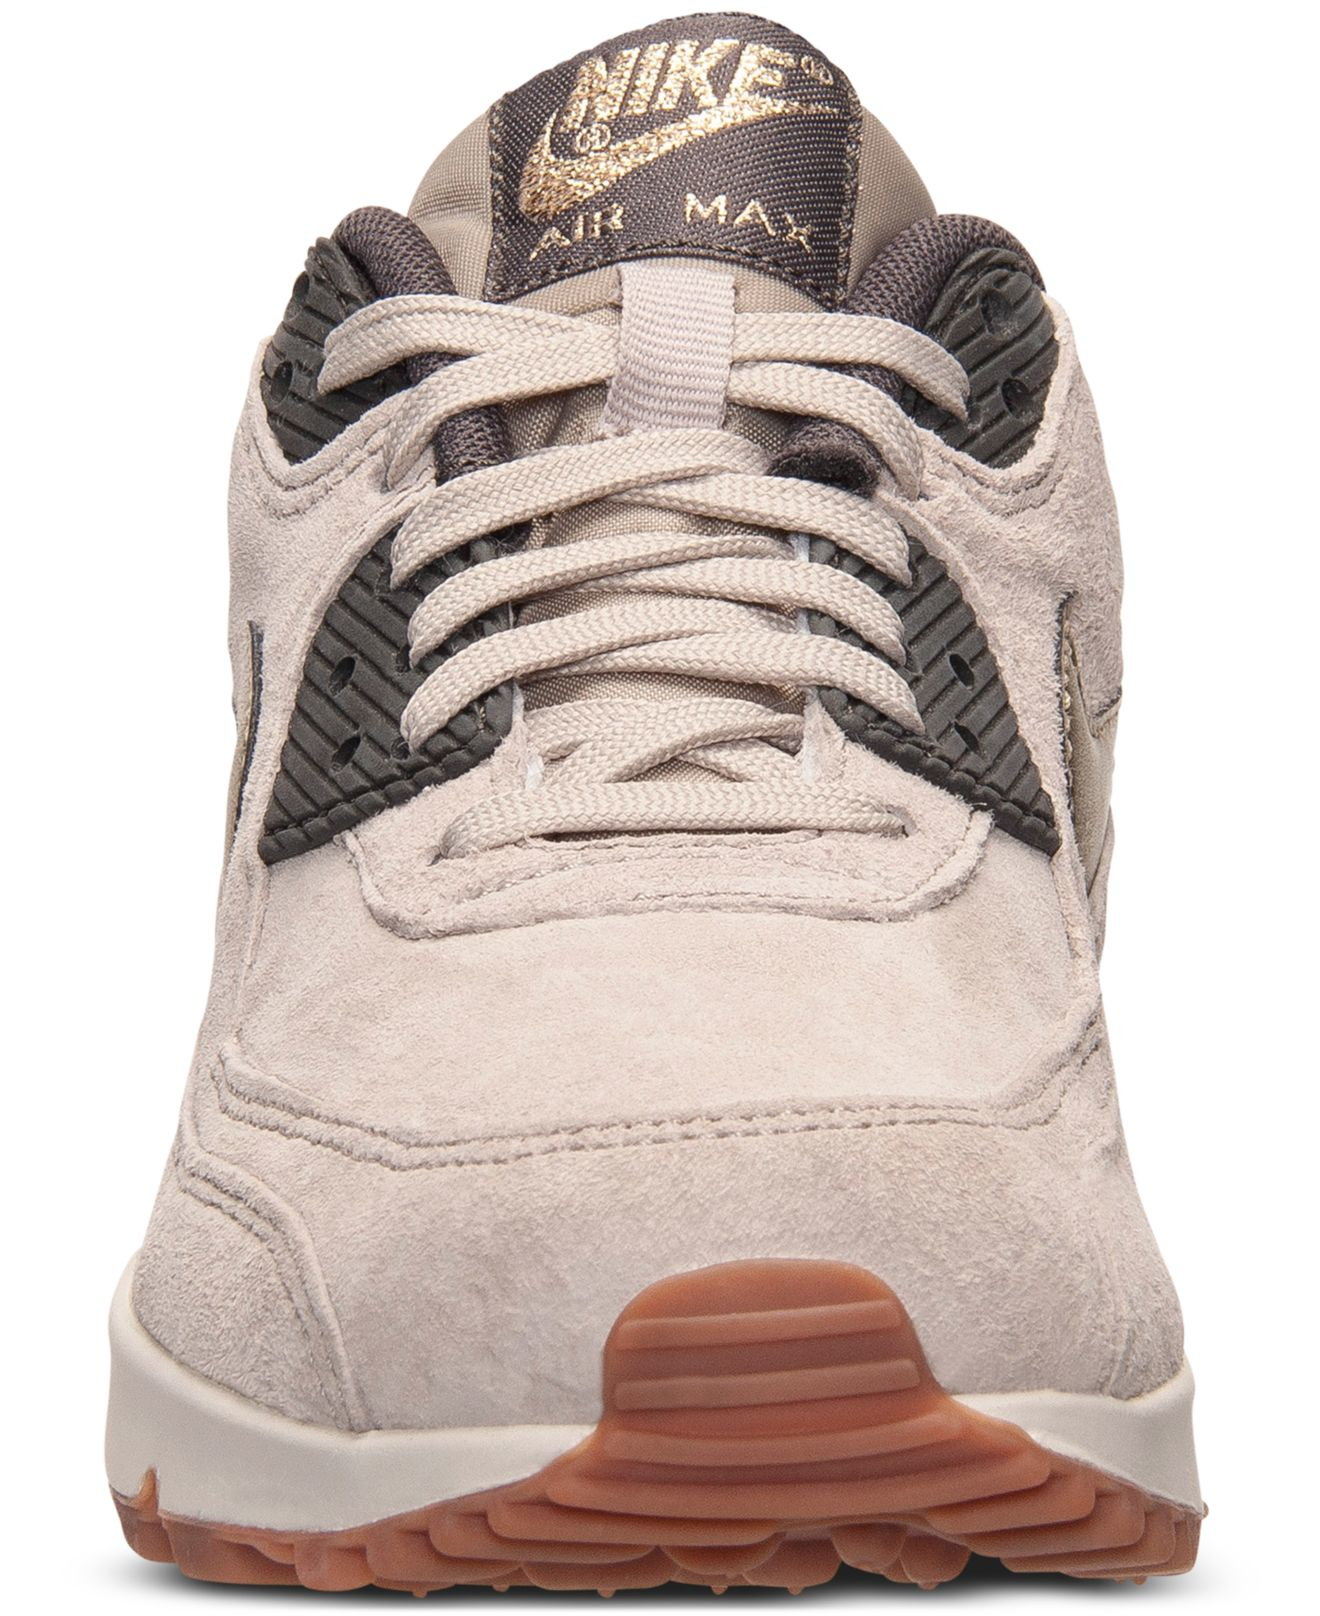 Nike Air Max 90 String Grano Mettodasic Oro En Grano String 477a98